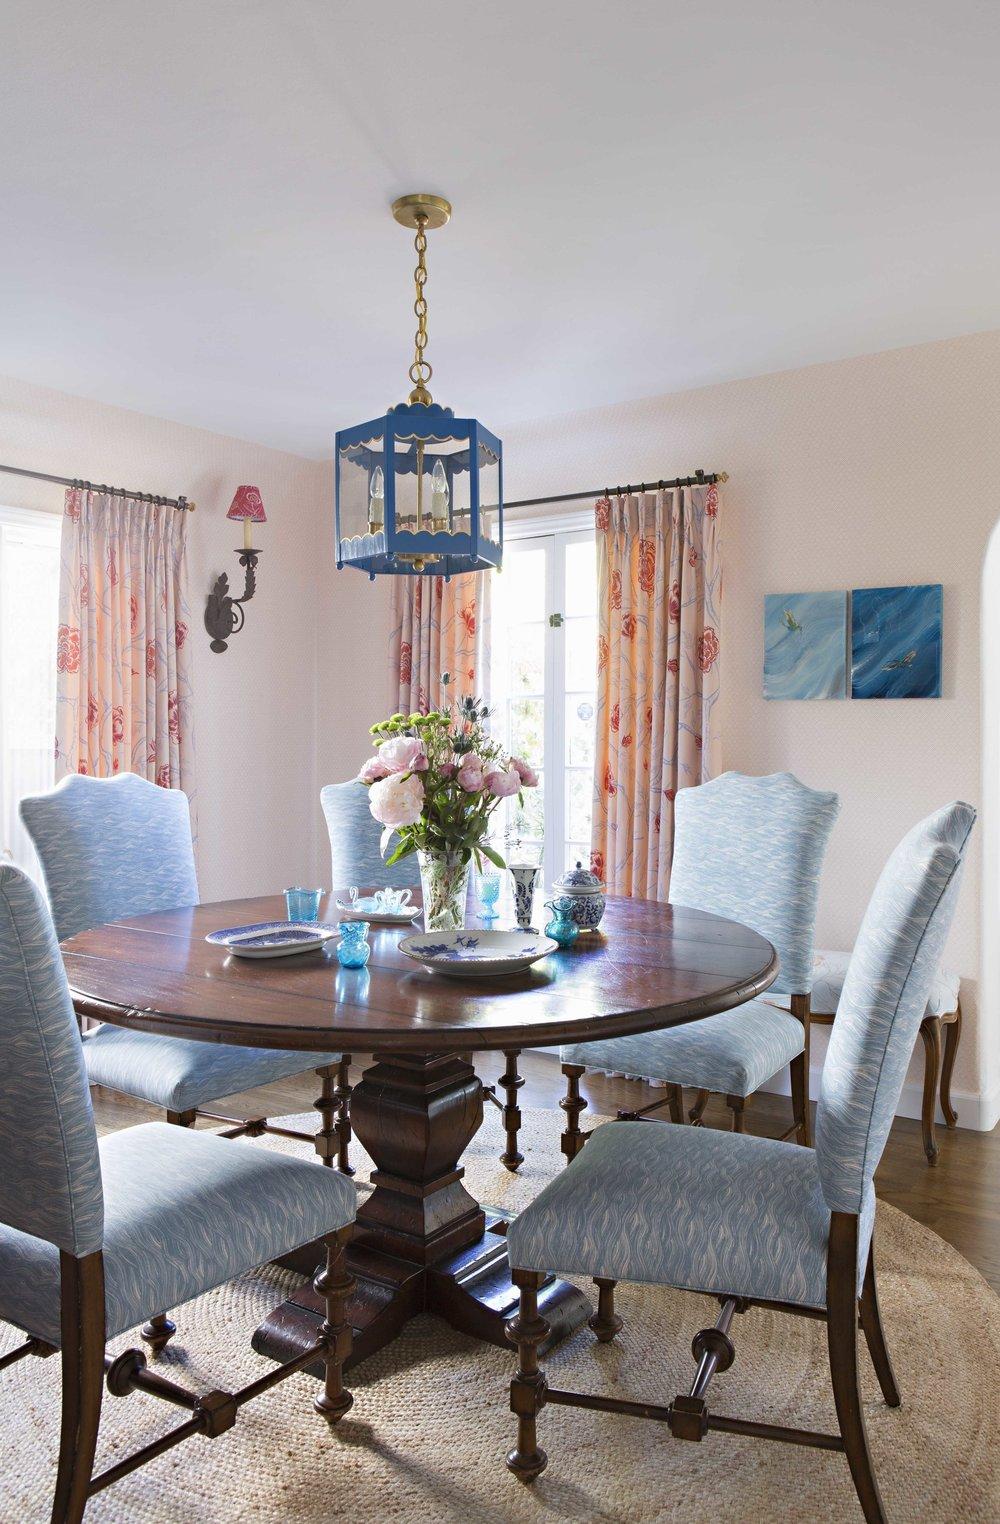 Basketweave Wallpaper in Blush in Sharon's Dining Room